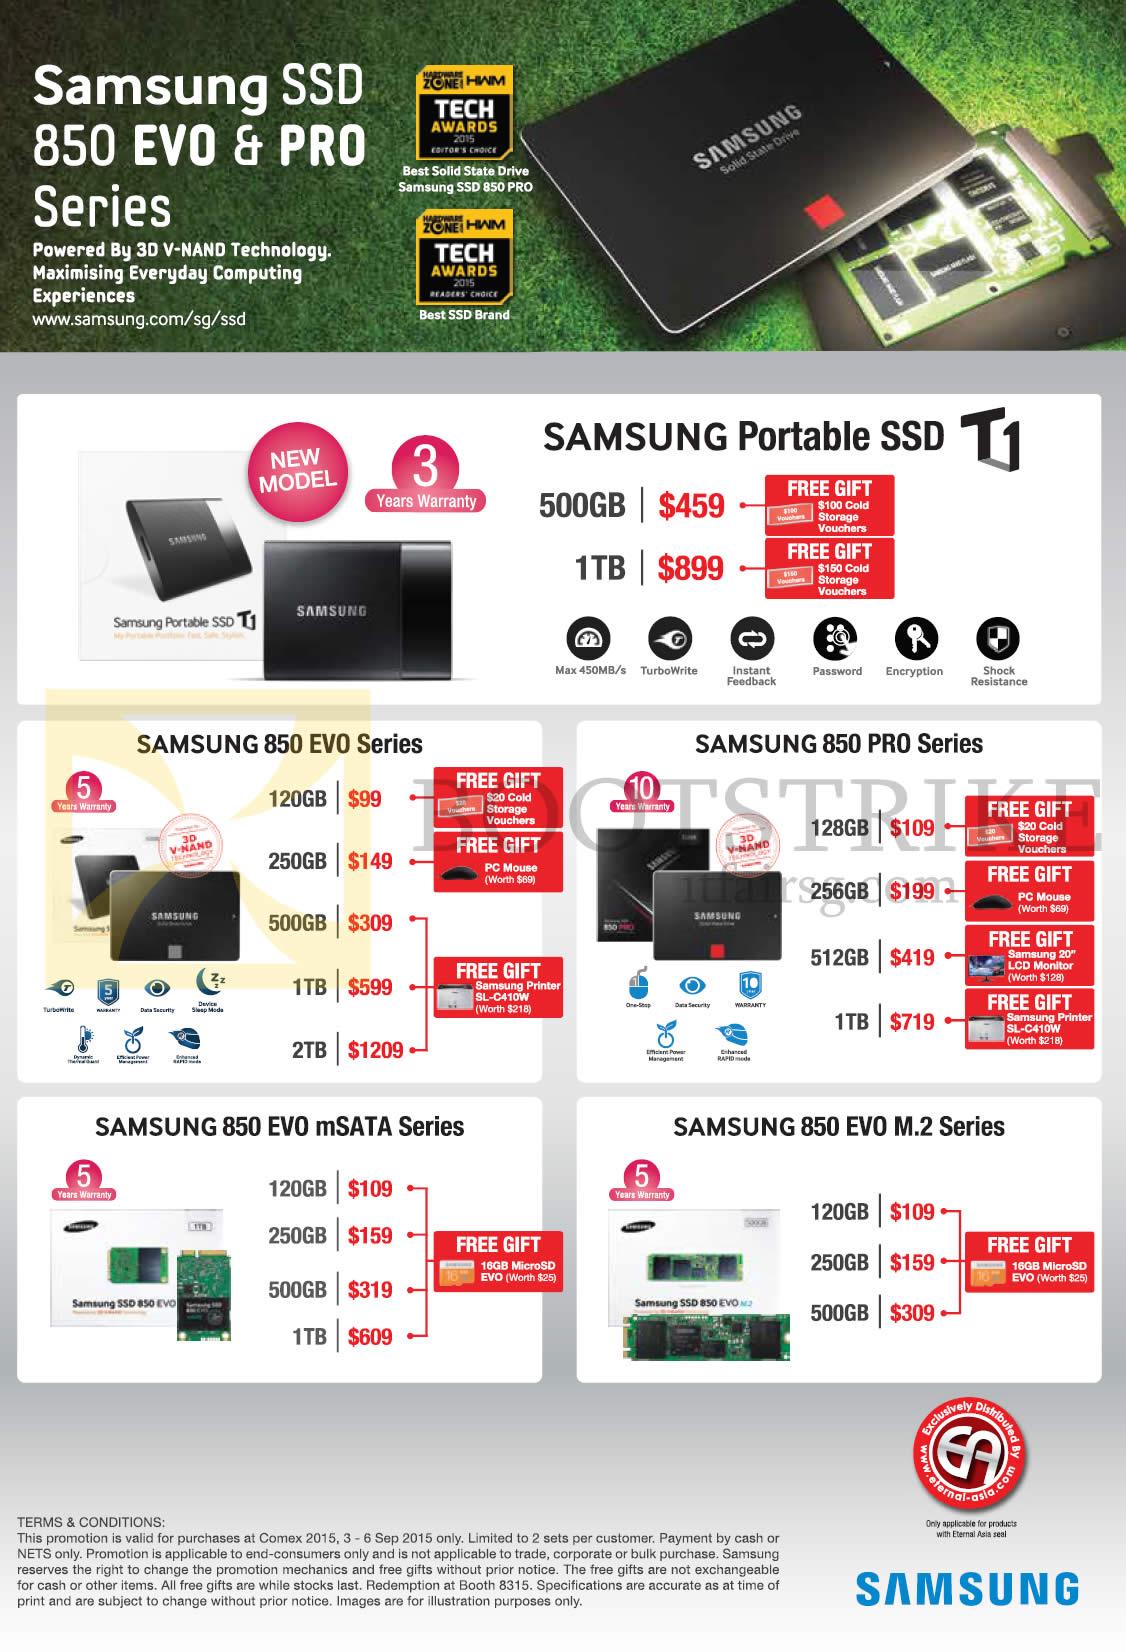 COMEX 2015 price list image brochure of Samsung SSD 850 EVO, PRO Series,  Portable. «